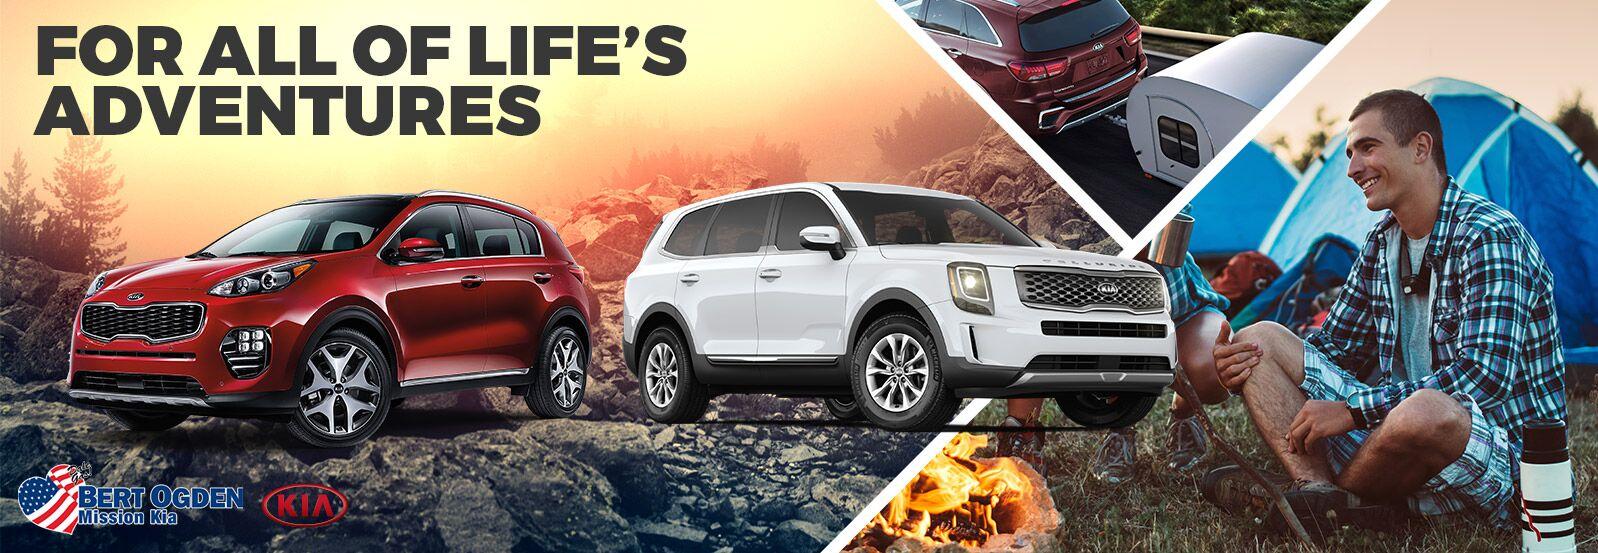 Kia Vehicles For Weekend Adventurers - Bert Ogden Mission Kia - Mission, TX